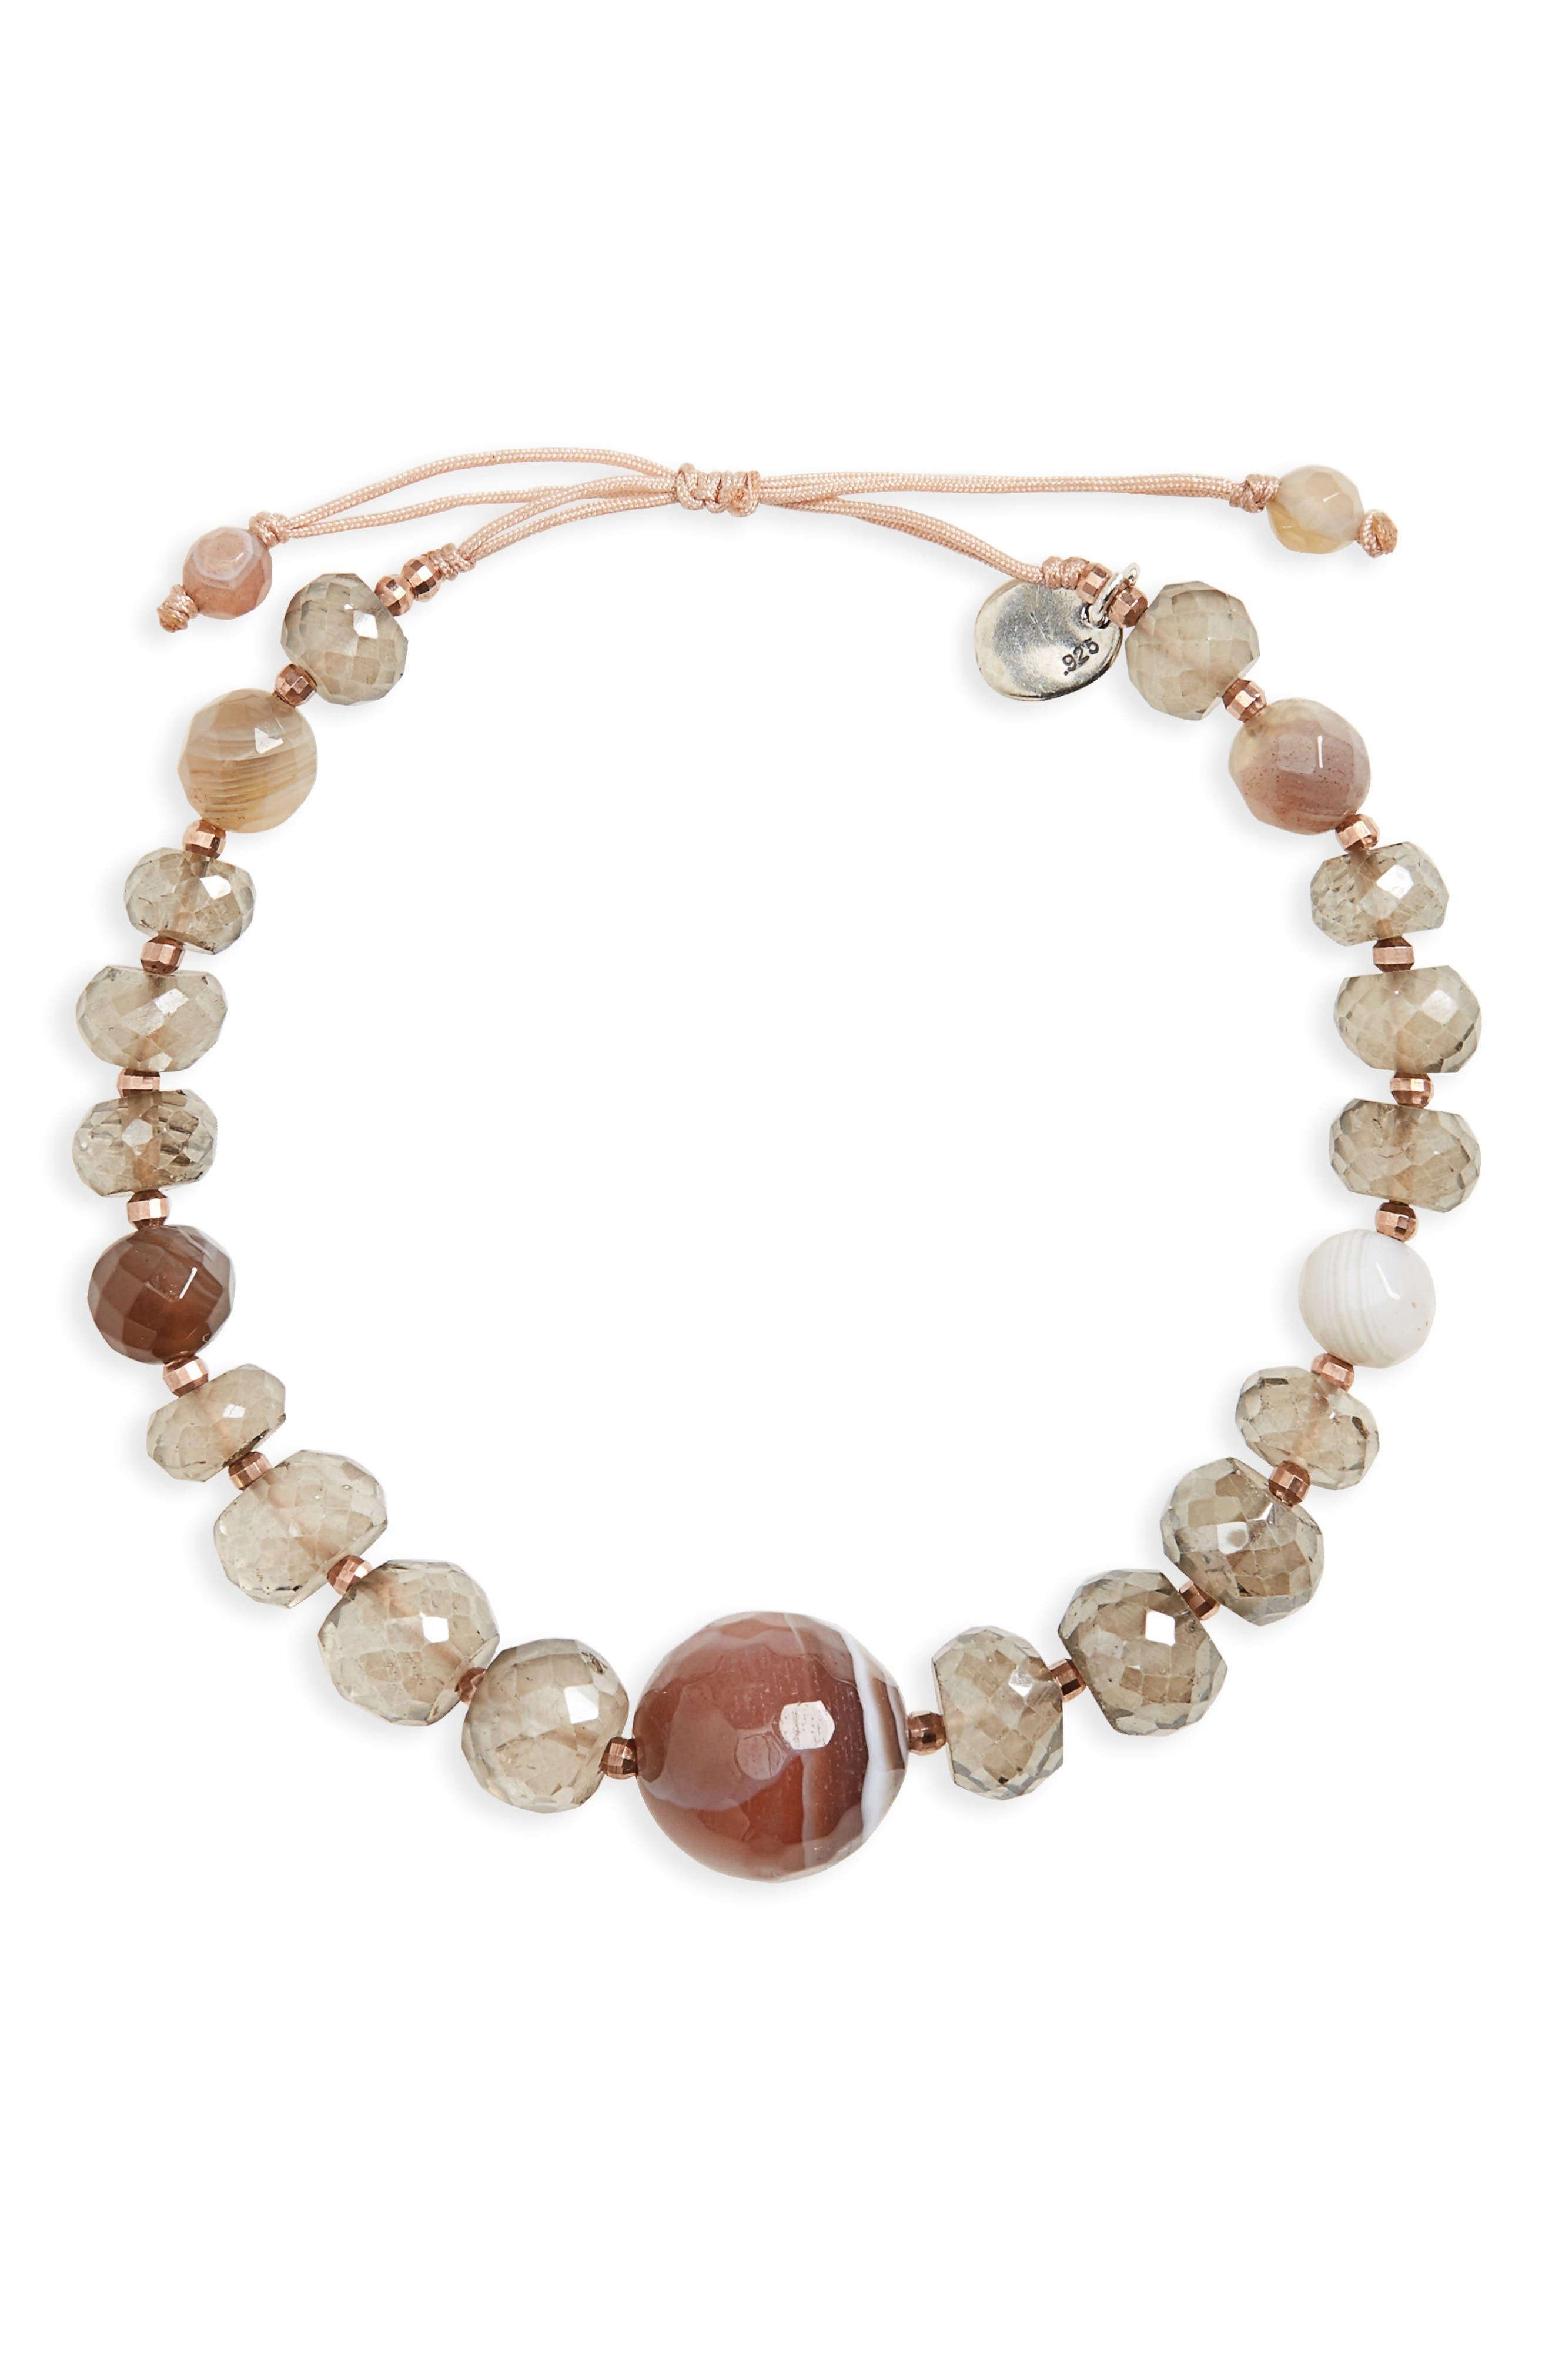 Main Image - Chan Luu Semiprecious Stone Beaded Bracelet